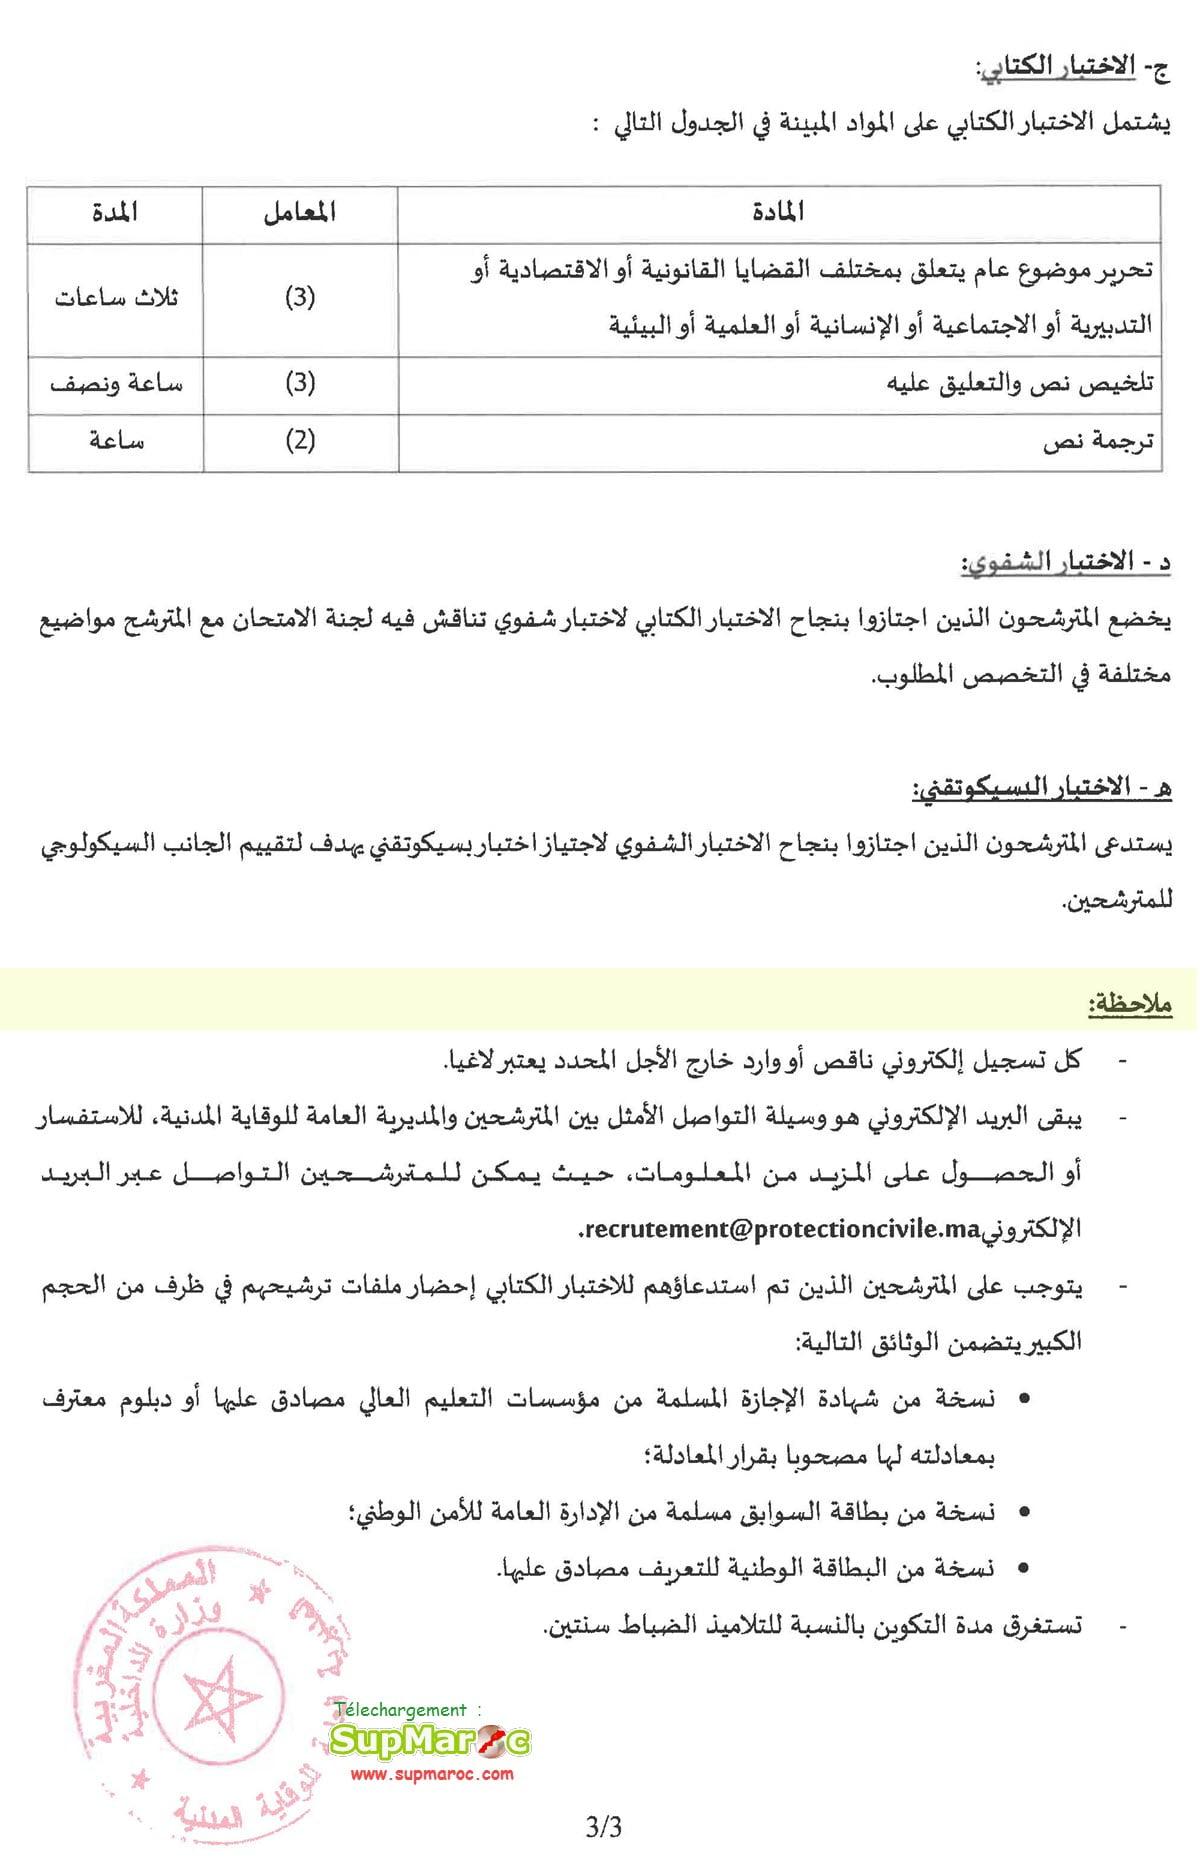 Protection Civile Recrutement 40 Élèves officiers 2020 المدرسة الوطنية للوقاية المدنية